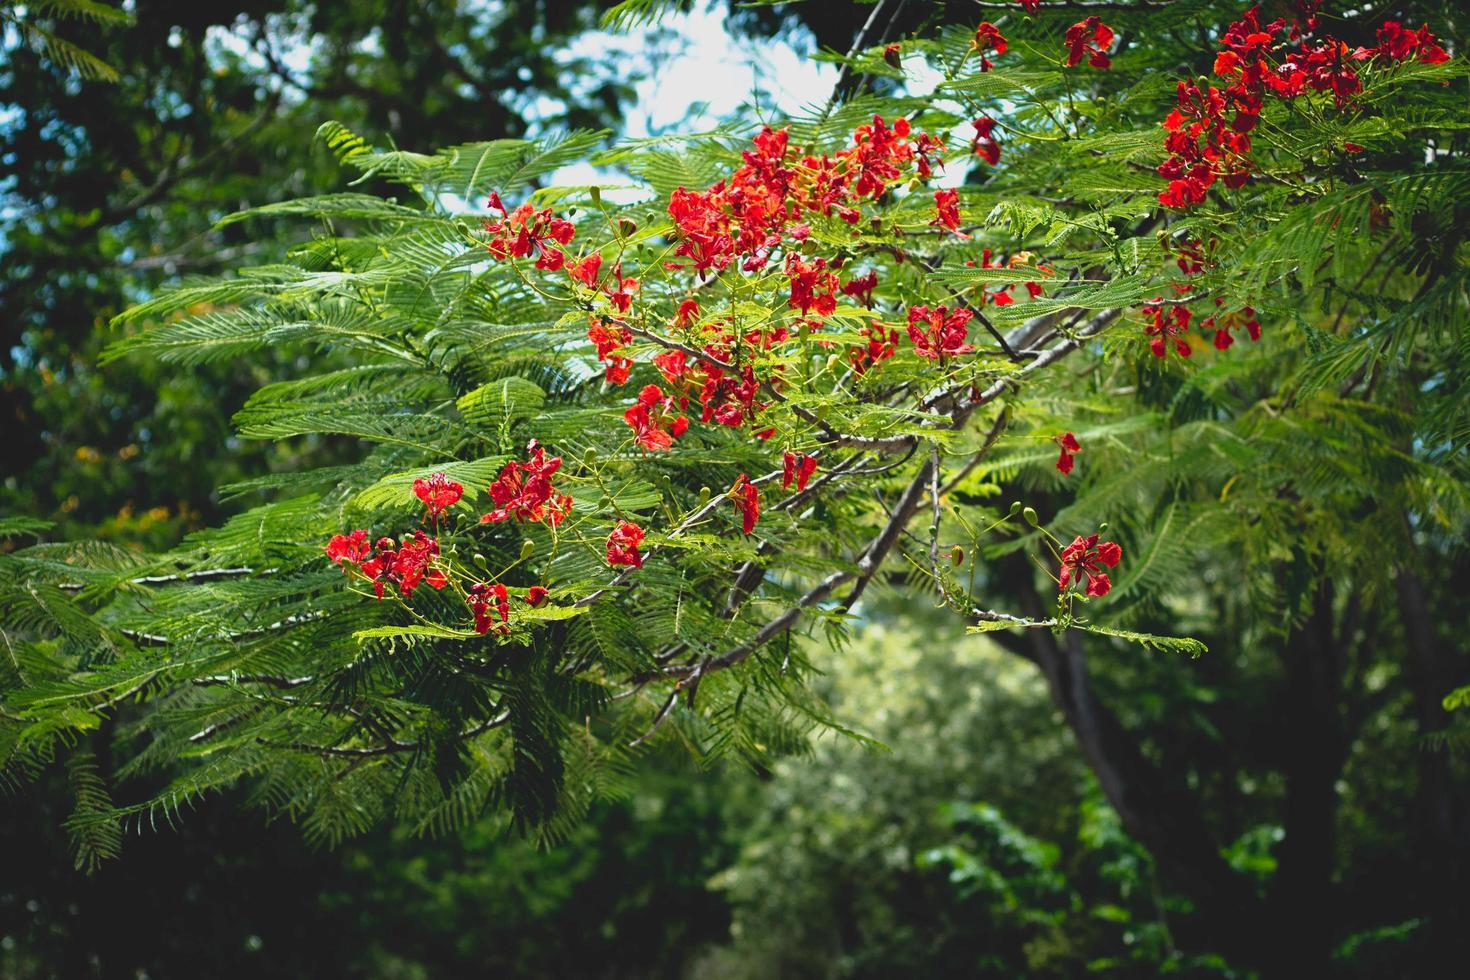 rode royal poinciana bloemen buiten foto